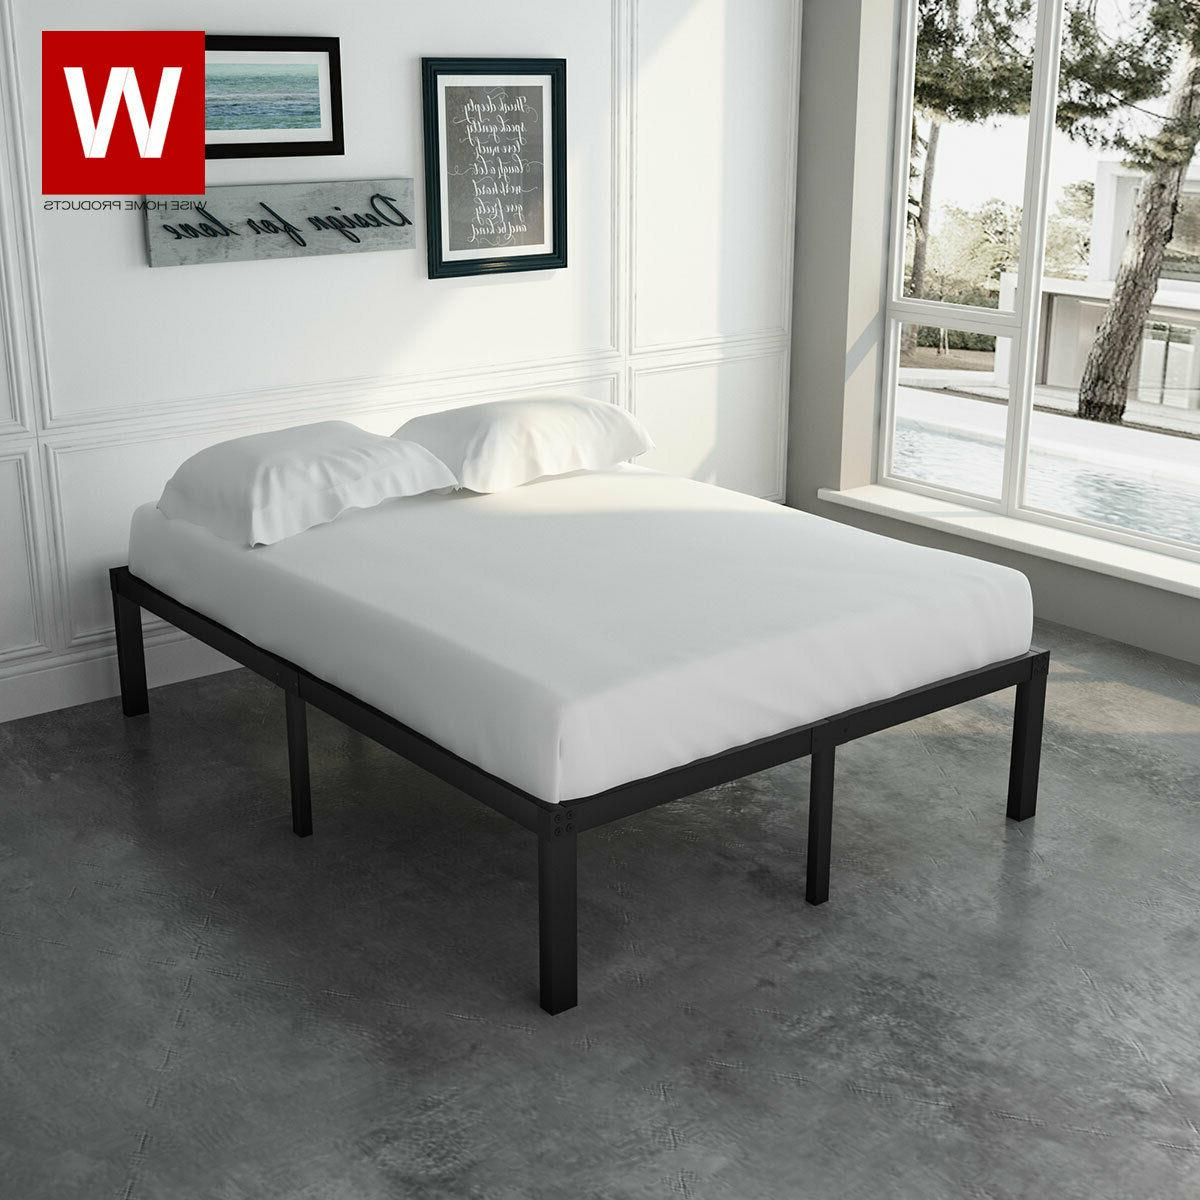 Full Steel Bed - Platform -